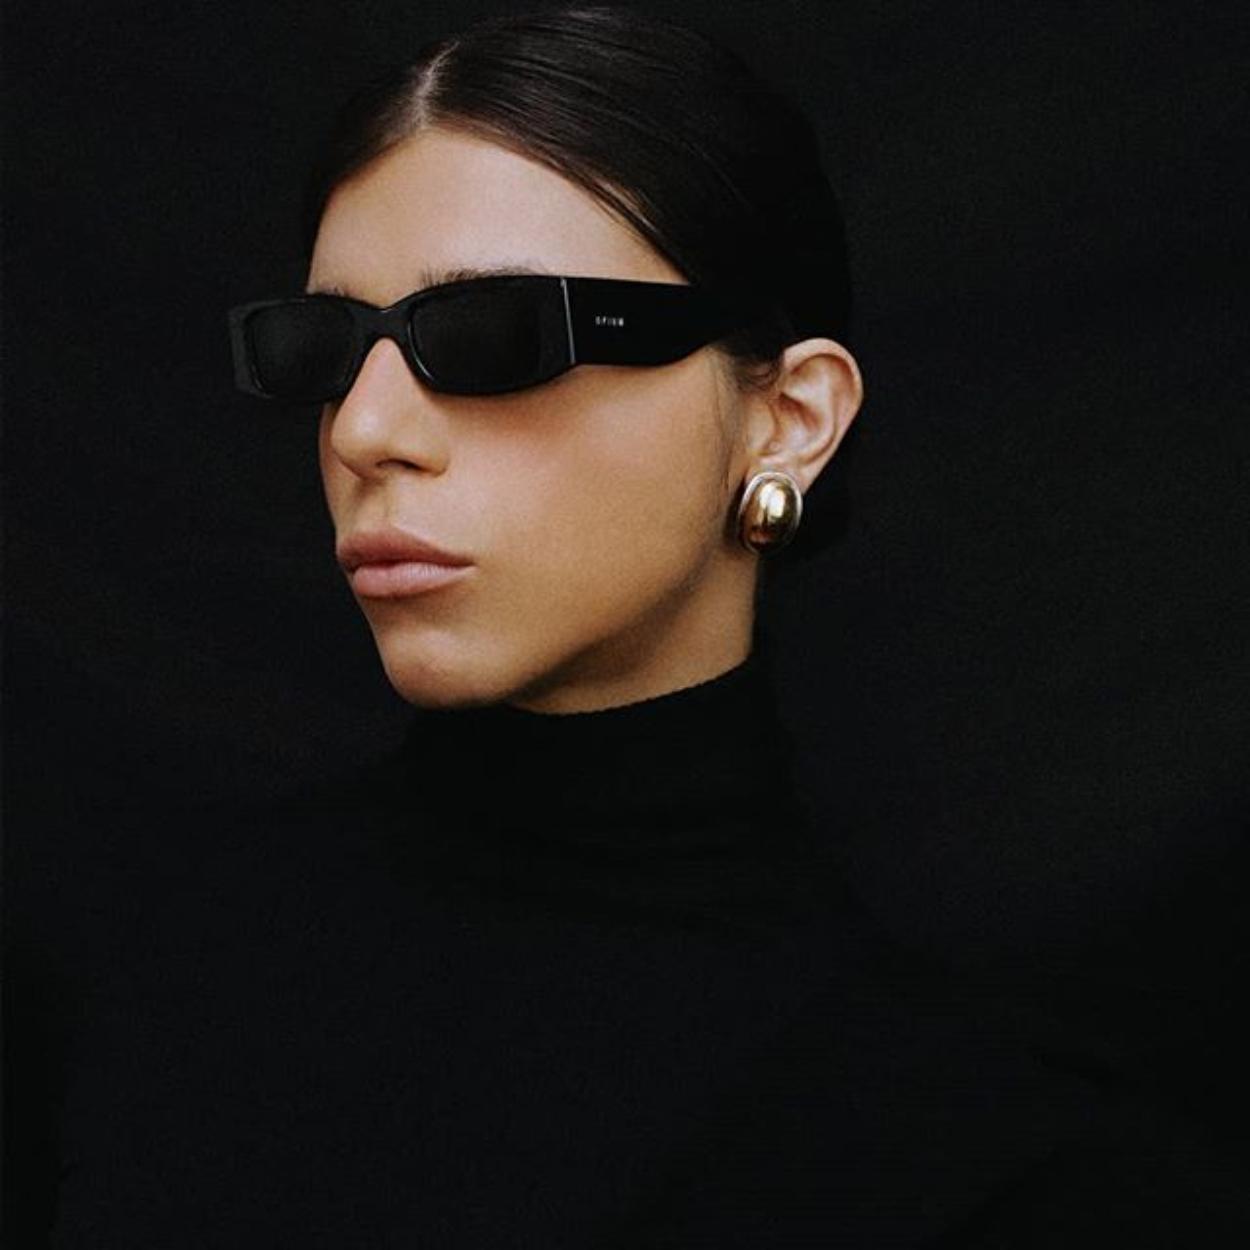 Giorgia Narciso Born to Fashion